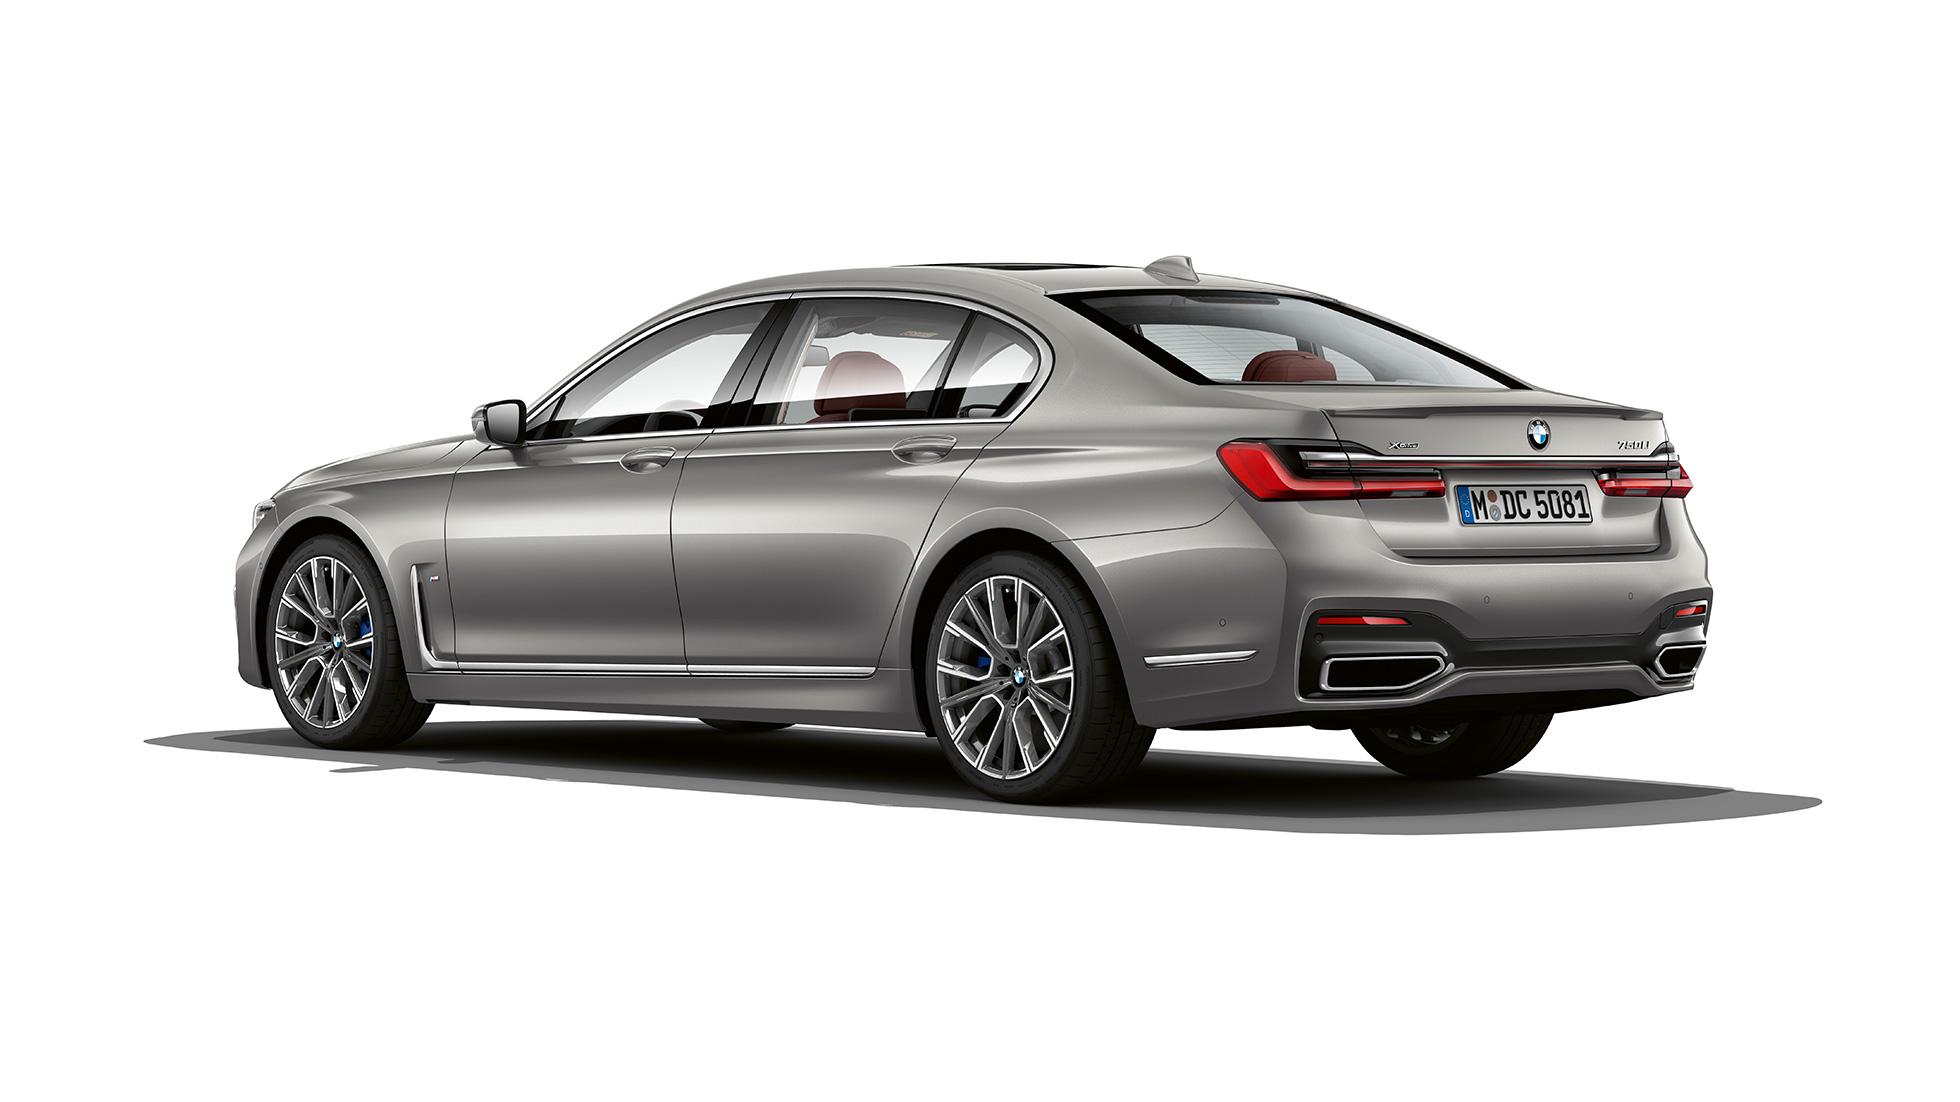 bmw-7series-sedan-inform-line-02-slide-02